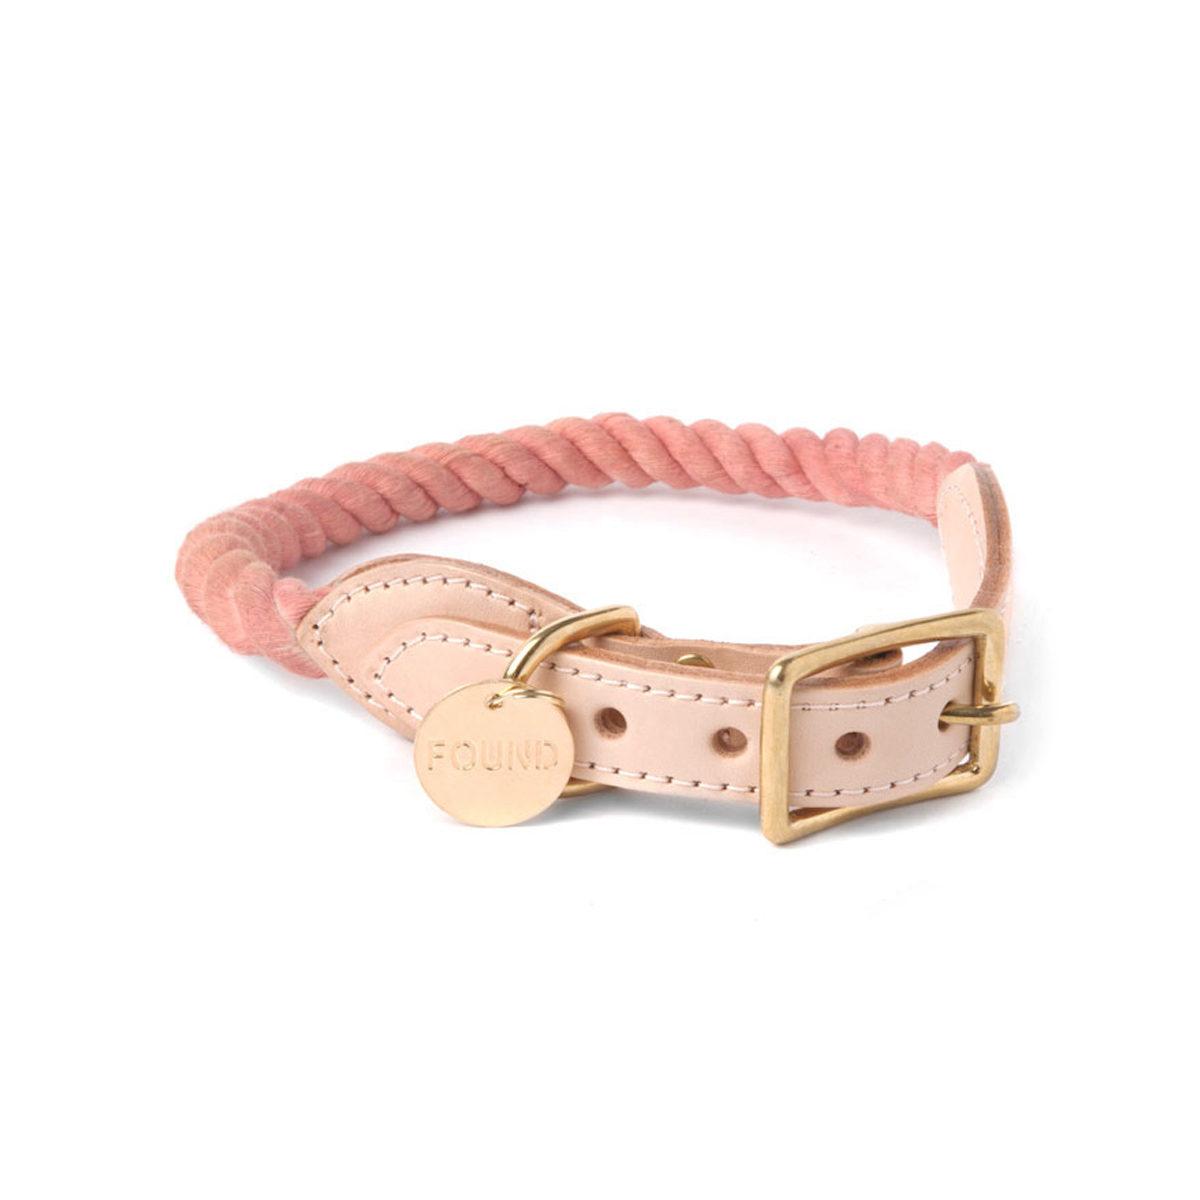 Blush cotton rope dog collar